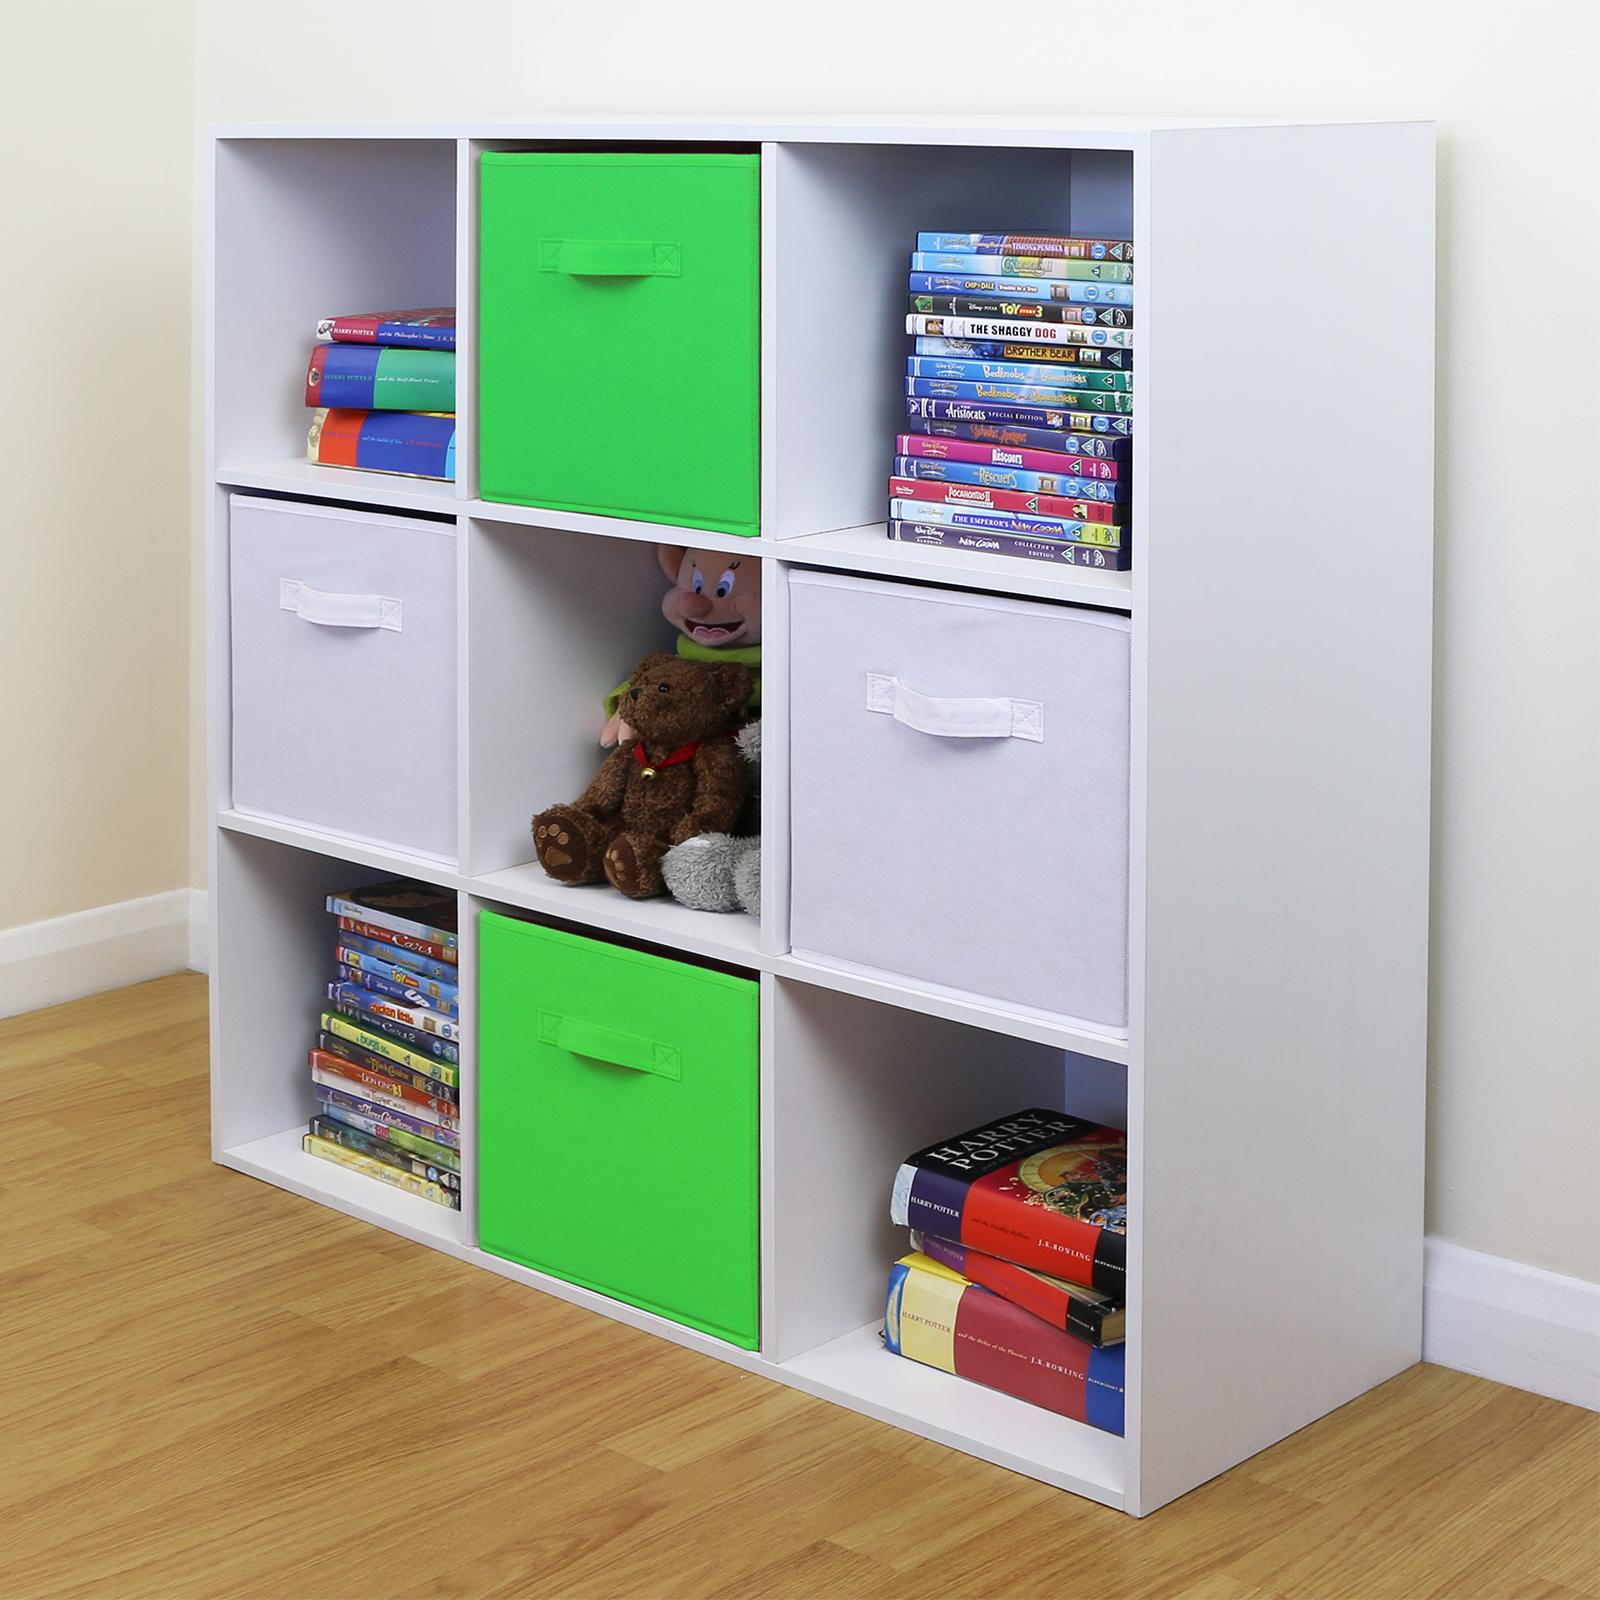 6 Cube Kids White Toy Games Storage Unit Girls Boys Childs: 9 Cube Kids Green & White Toy/Games Storage Unit Girls